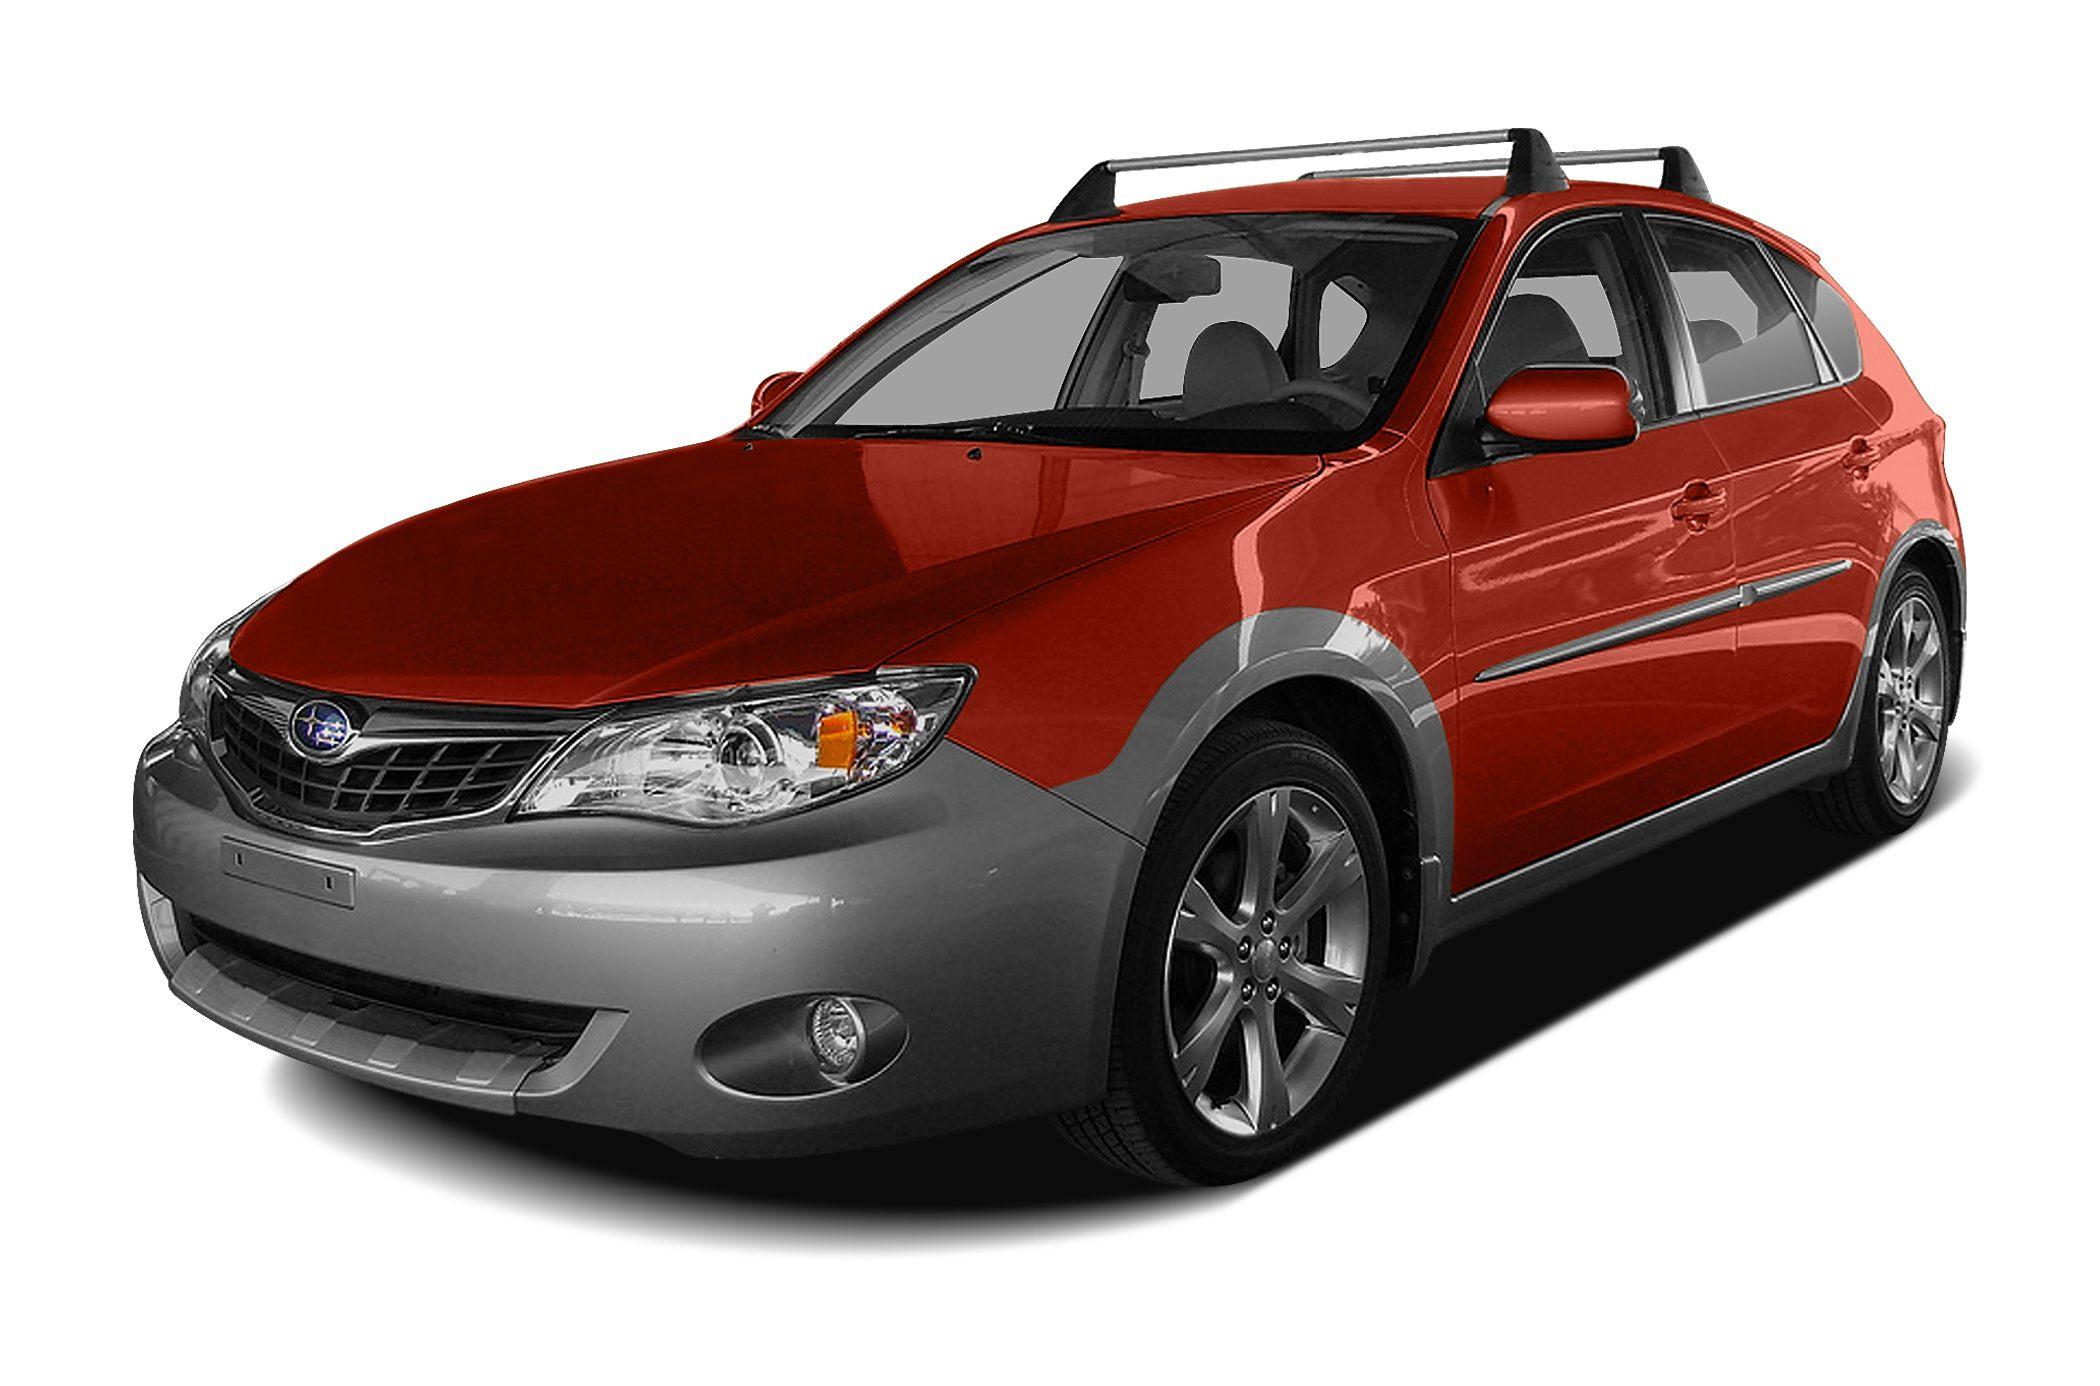 2010 Subaru Impreza Outback Sport LOW MILES - 24078 Outback Sport trim Heated Seats iPodMP3 In